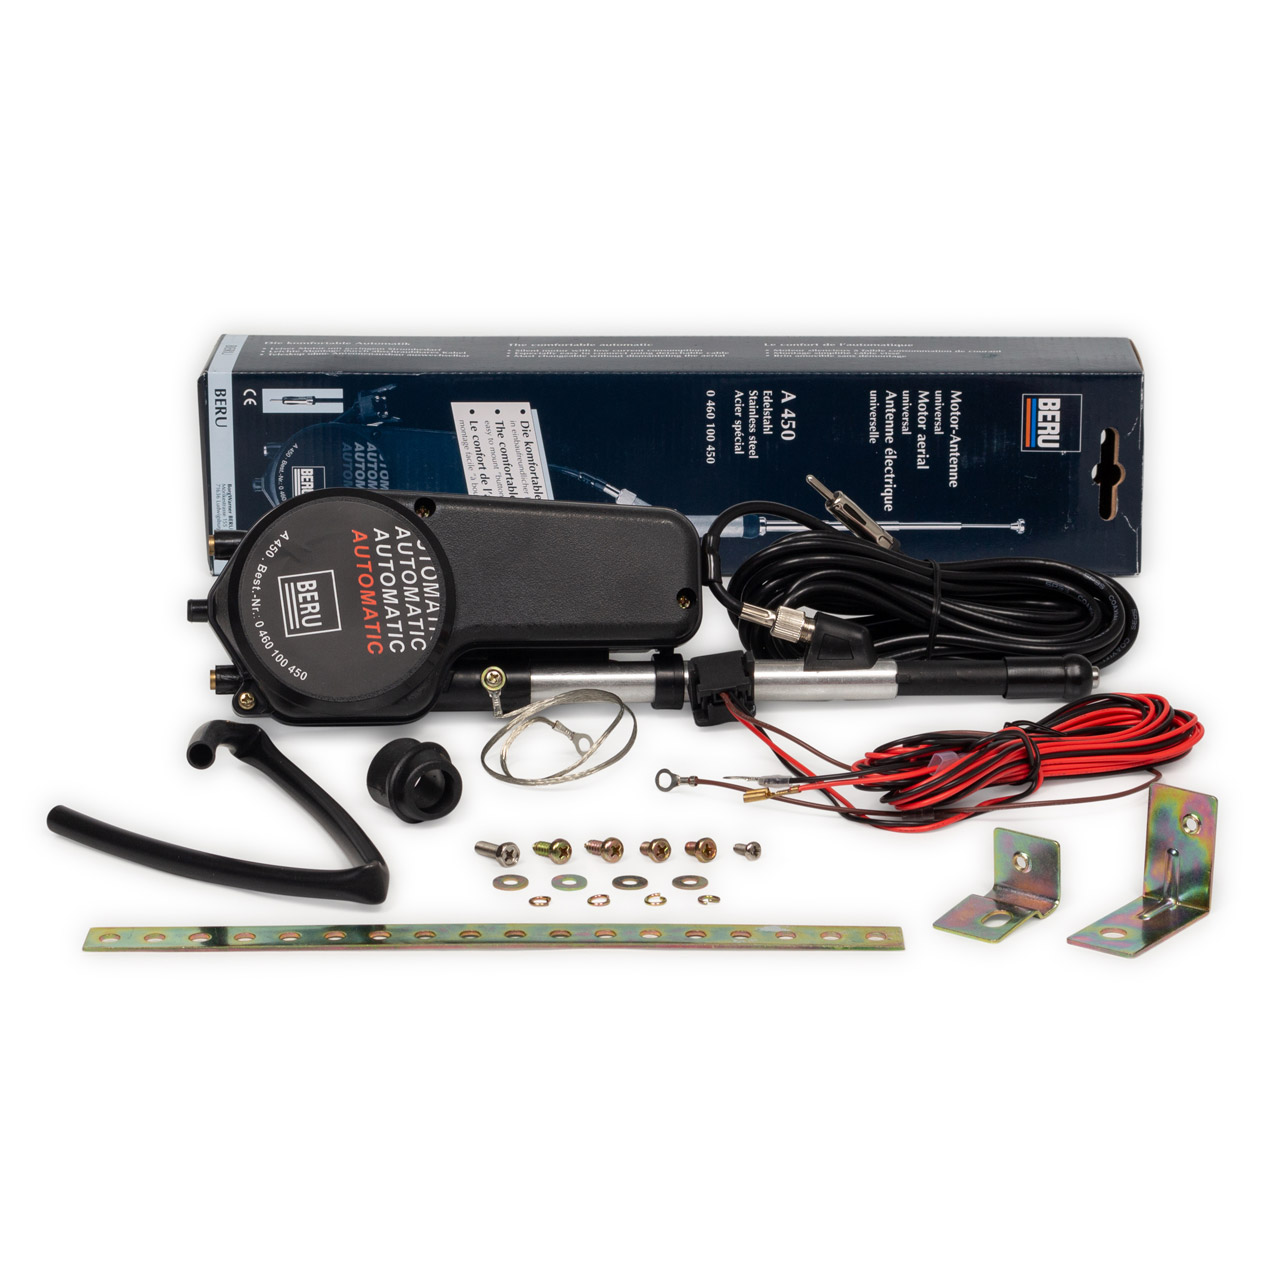 BERU A450 Antenne Heckantenne MERCEDES-BENZ 190 W201 W202 W210 W126